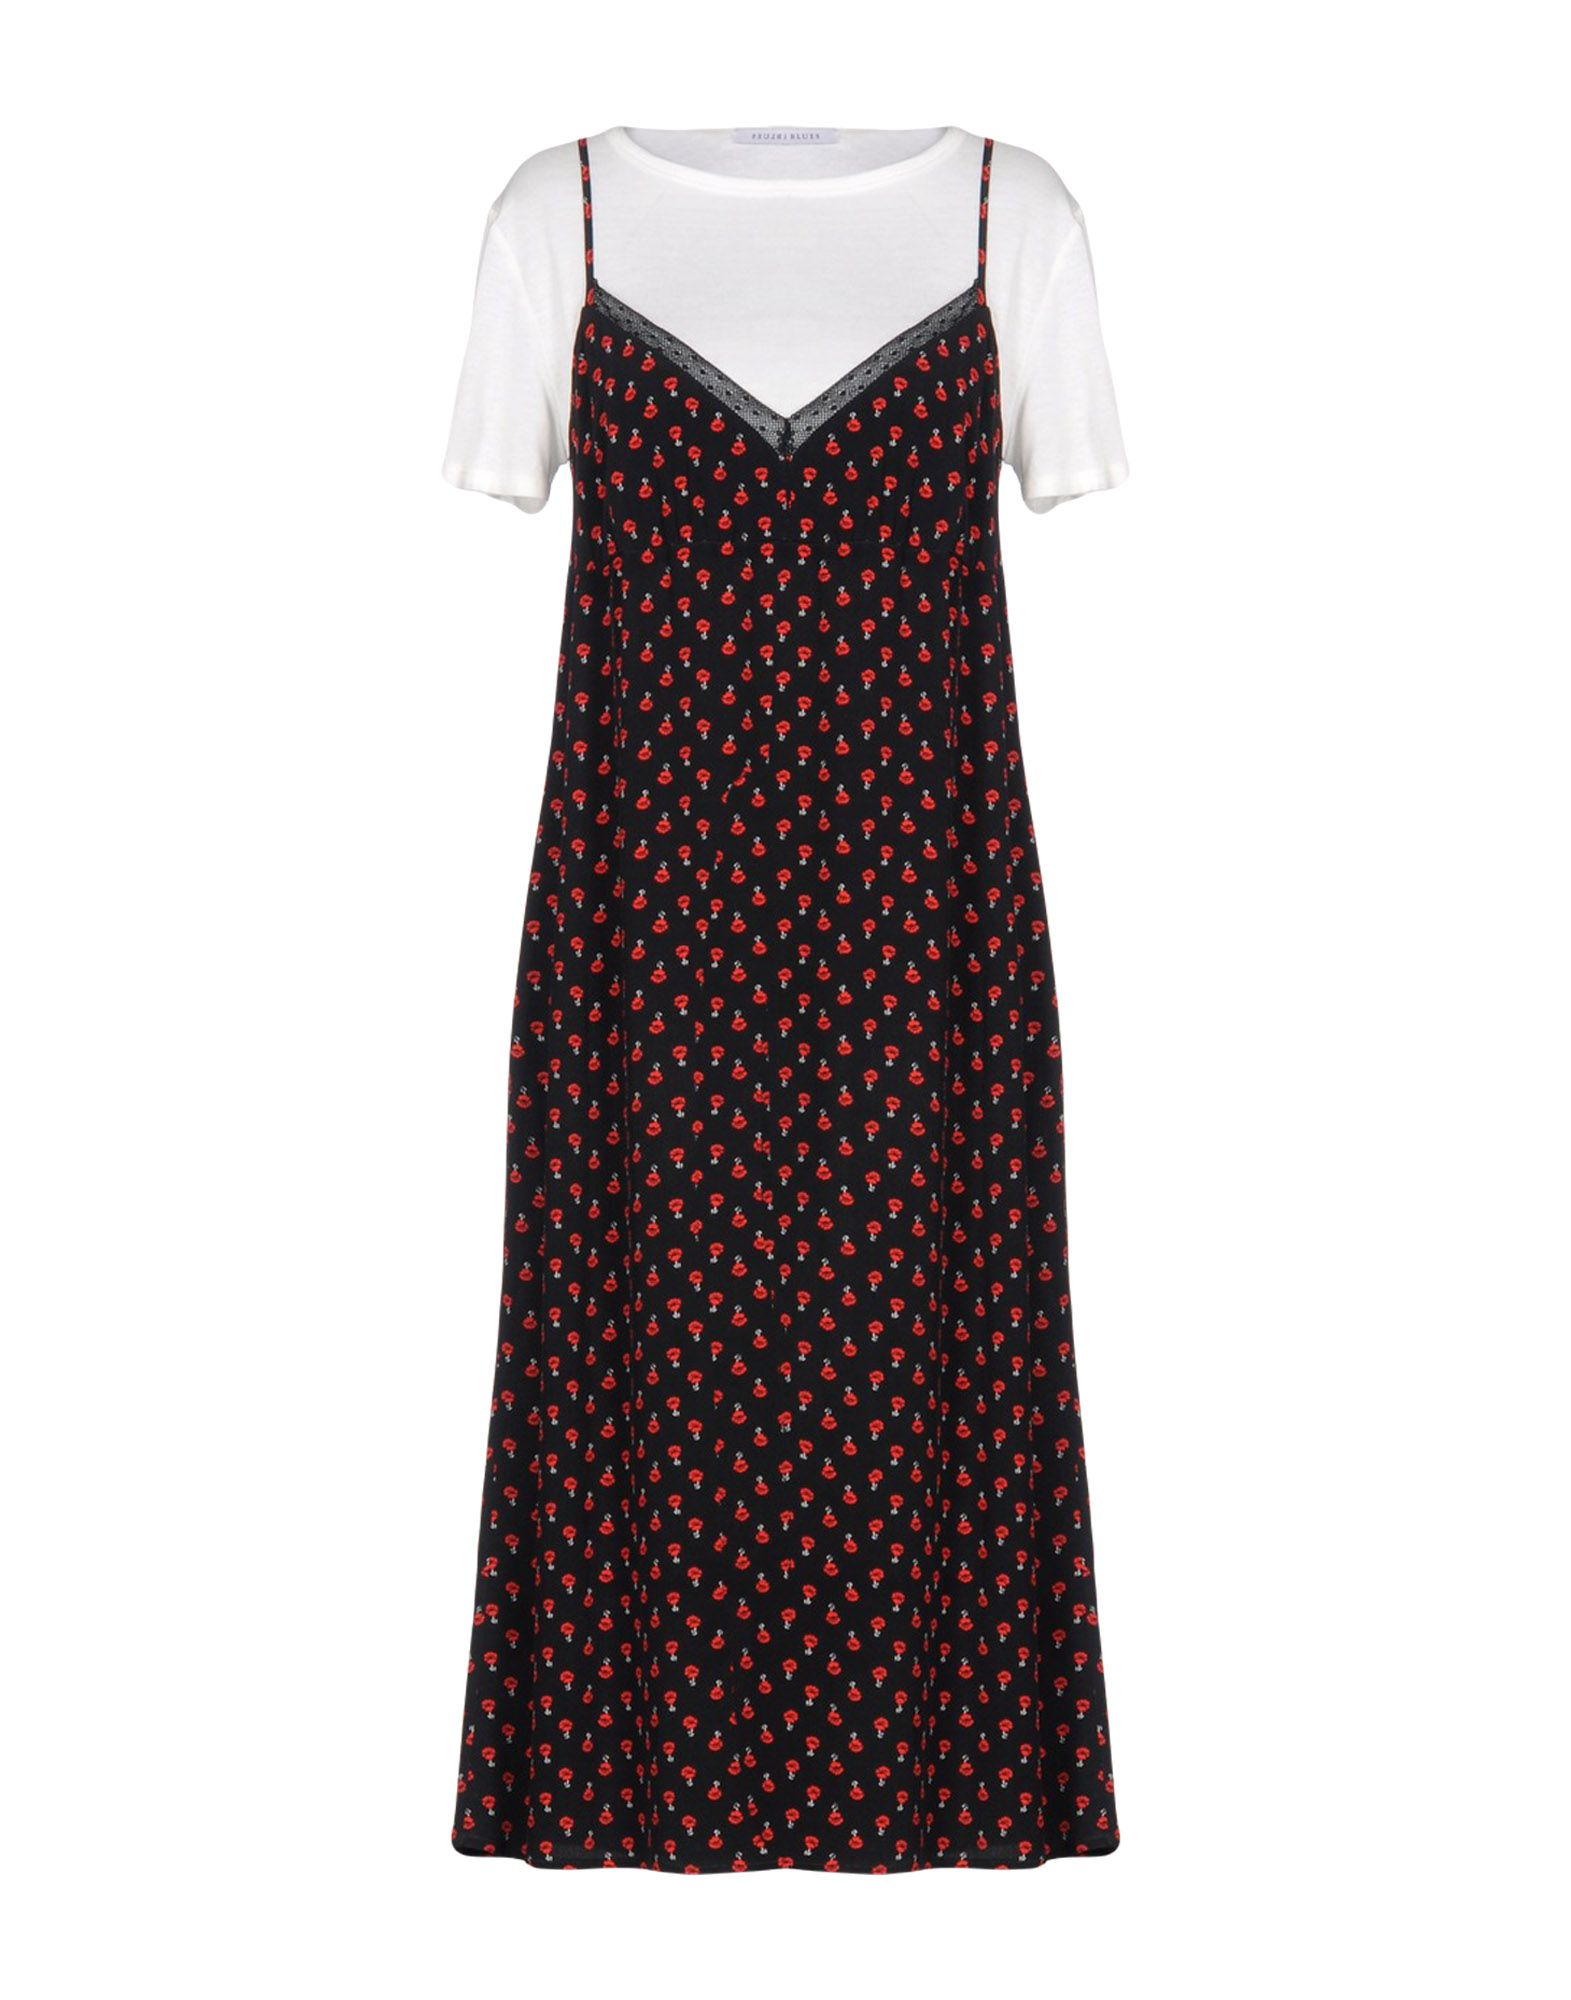 I BLUES Платье длиной 3/4 lisa corti платье длиной 3 4